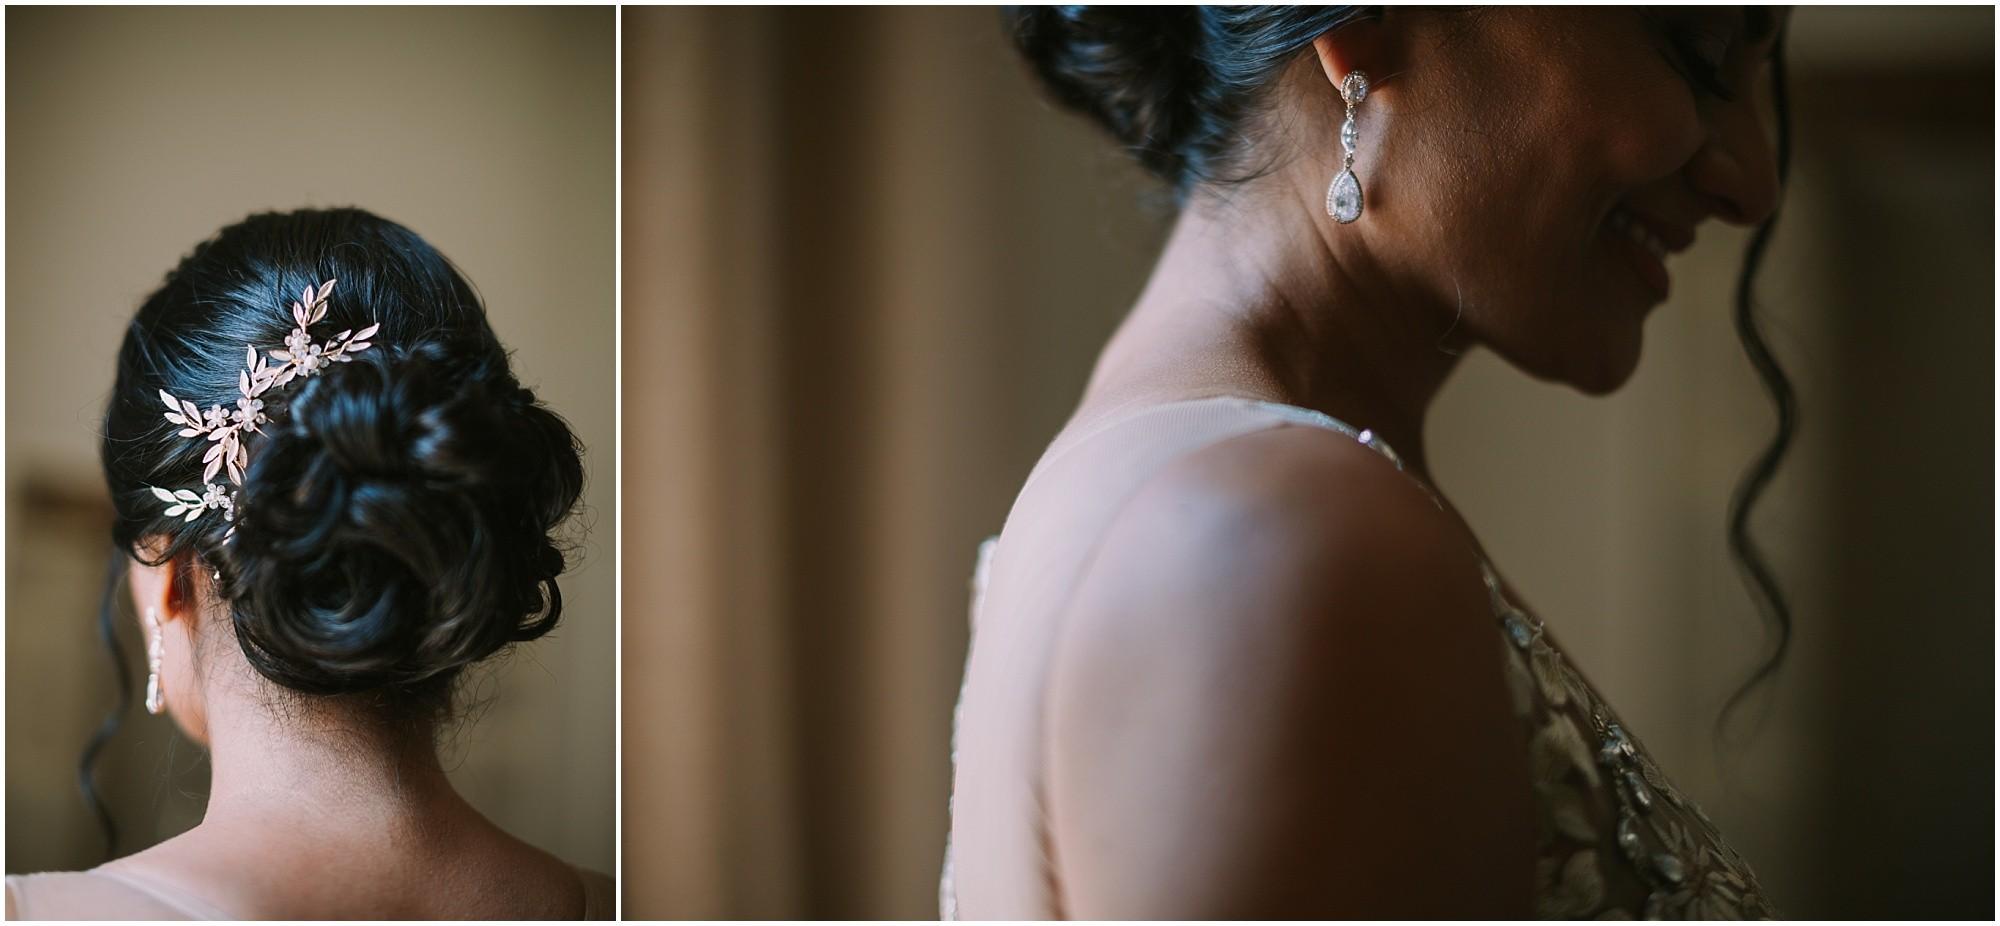 Kateryna-photos-photographer-mariage-chateau-saint-paterne-alencon-normandie-mayenne-le-mans_0036.jpg